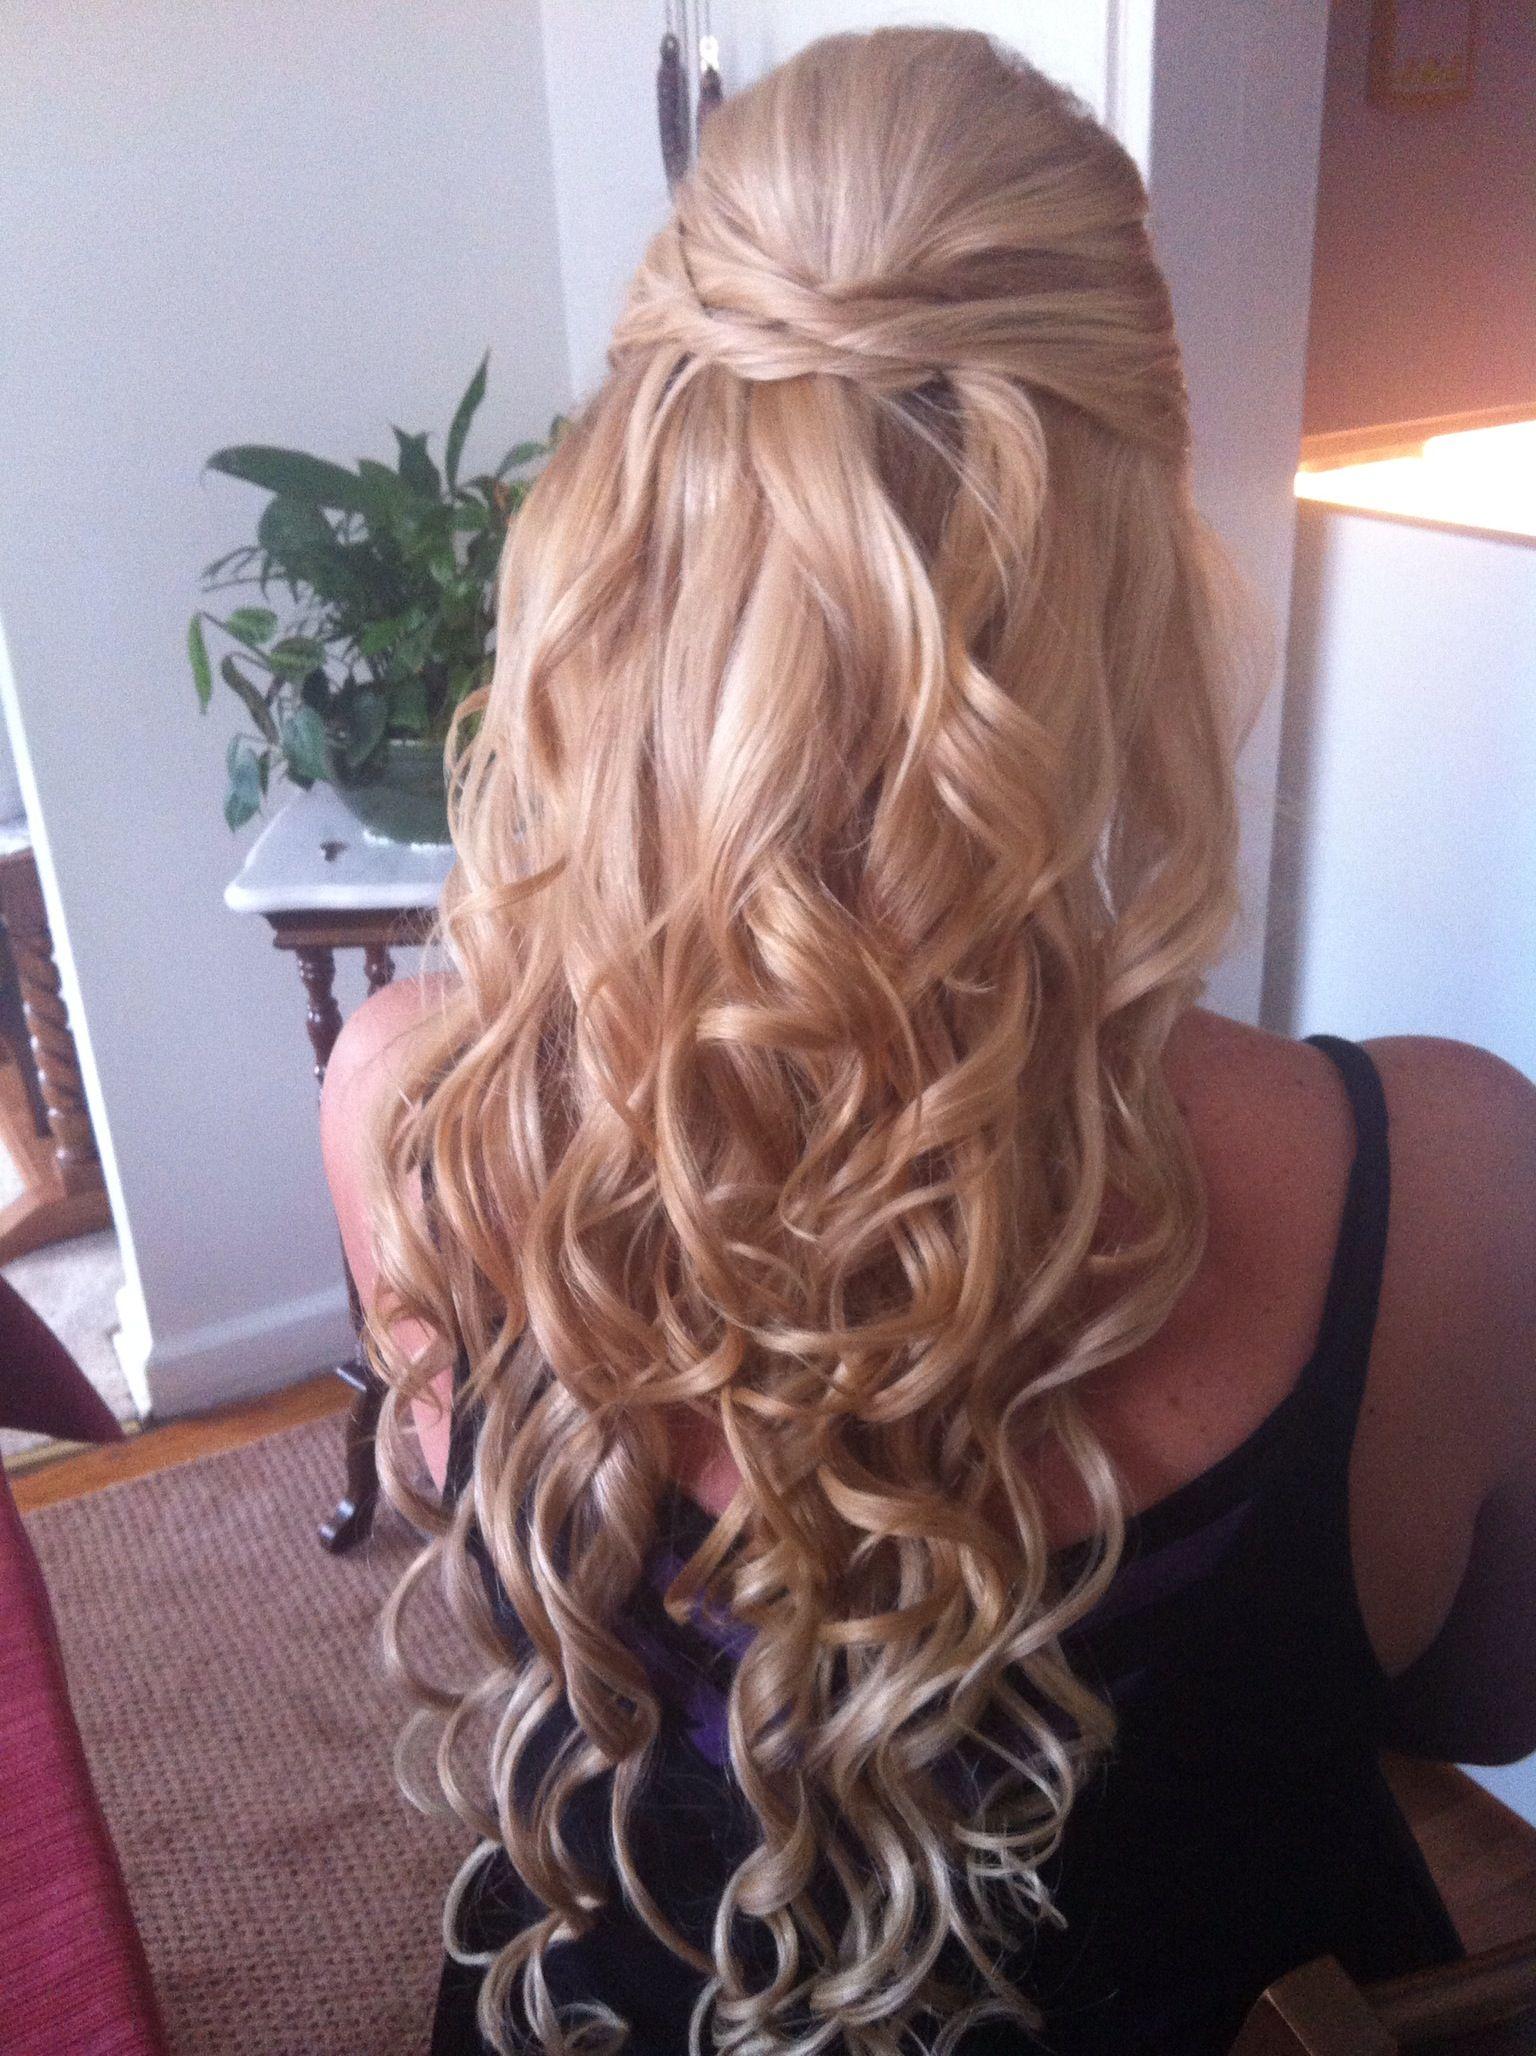 Wedding hair love the long spiral curls